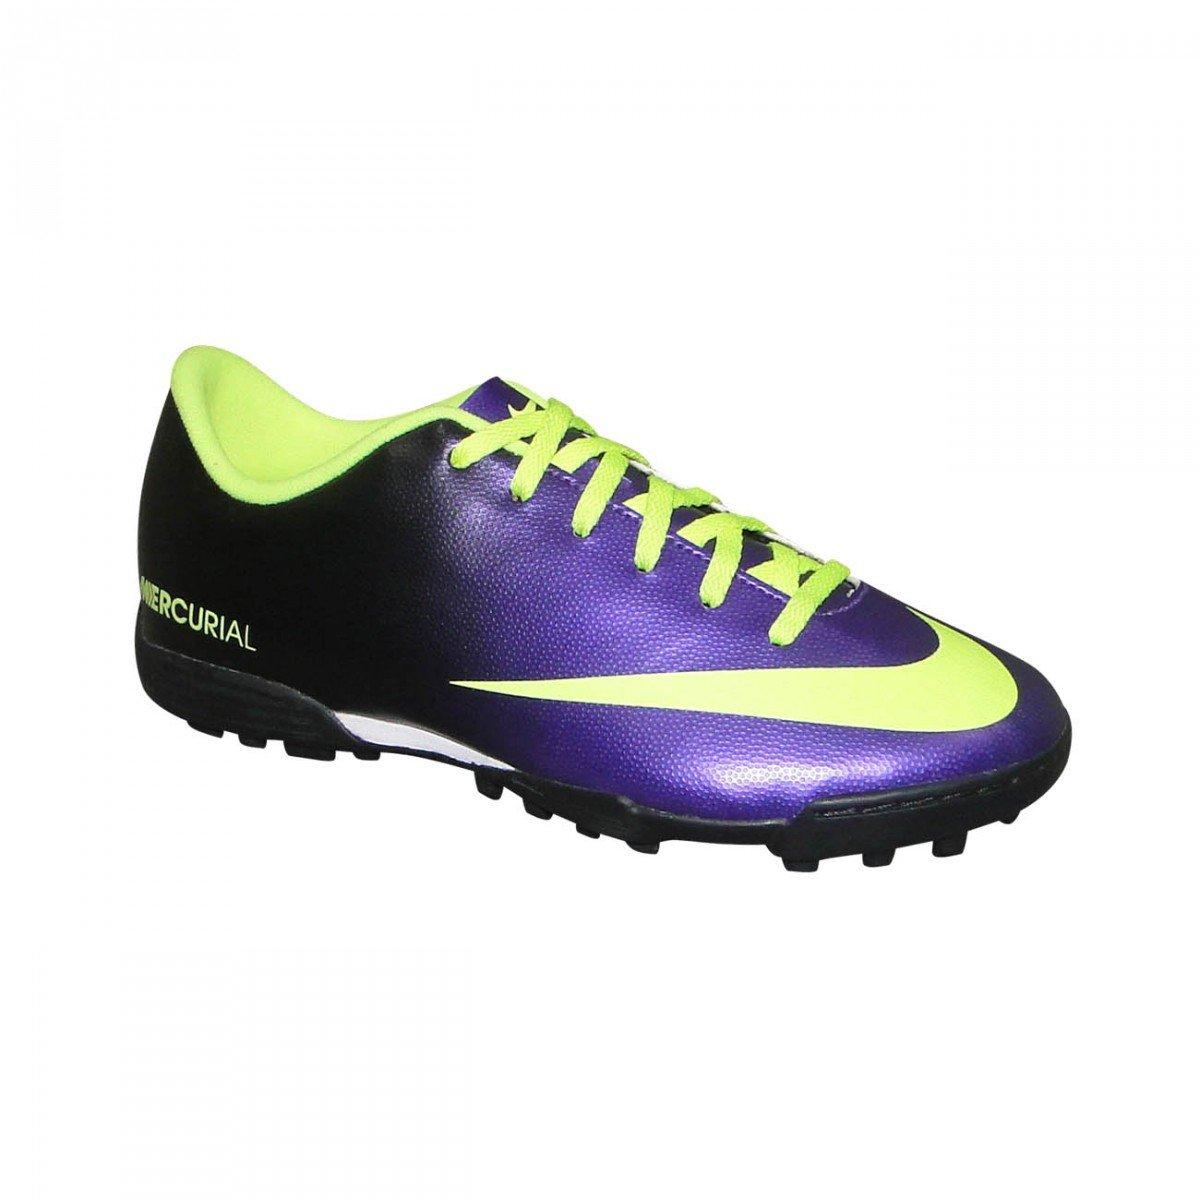 Chuteira Society Nike Mercurial Vortex Infantil - Compre Agora ... 12186ea279010